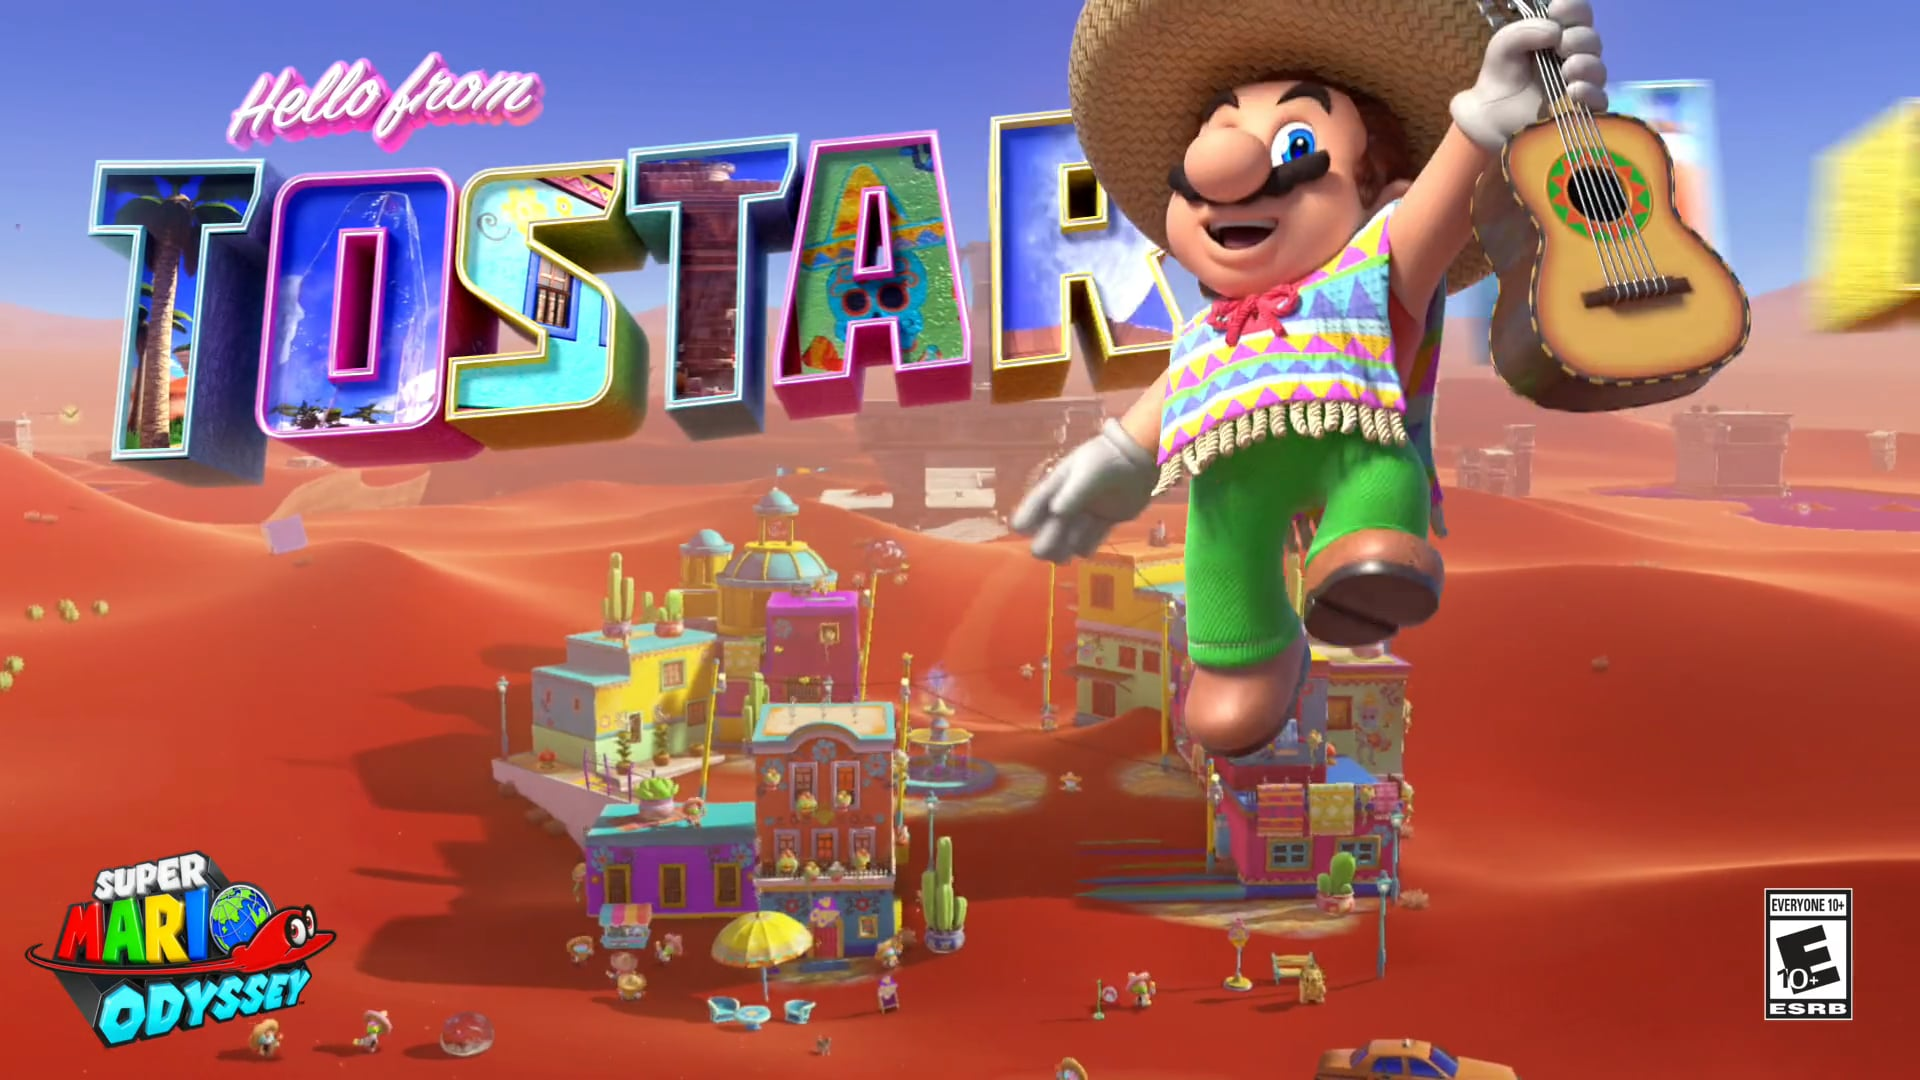 Super Mario Odyssey - Tostarena Spot #1